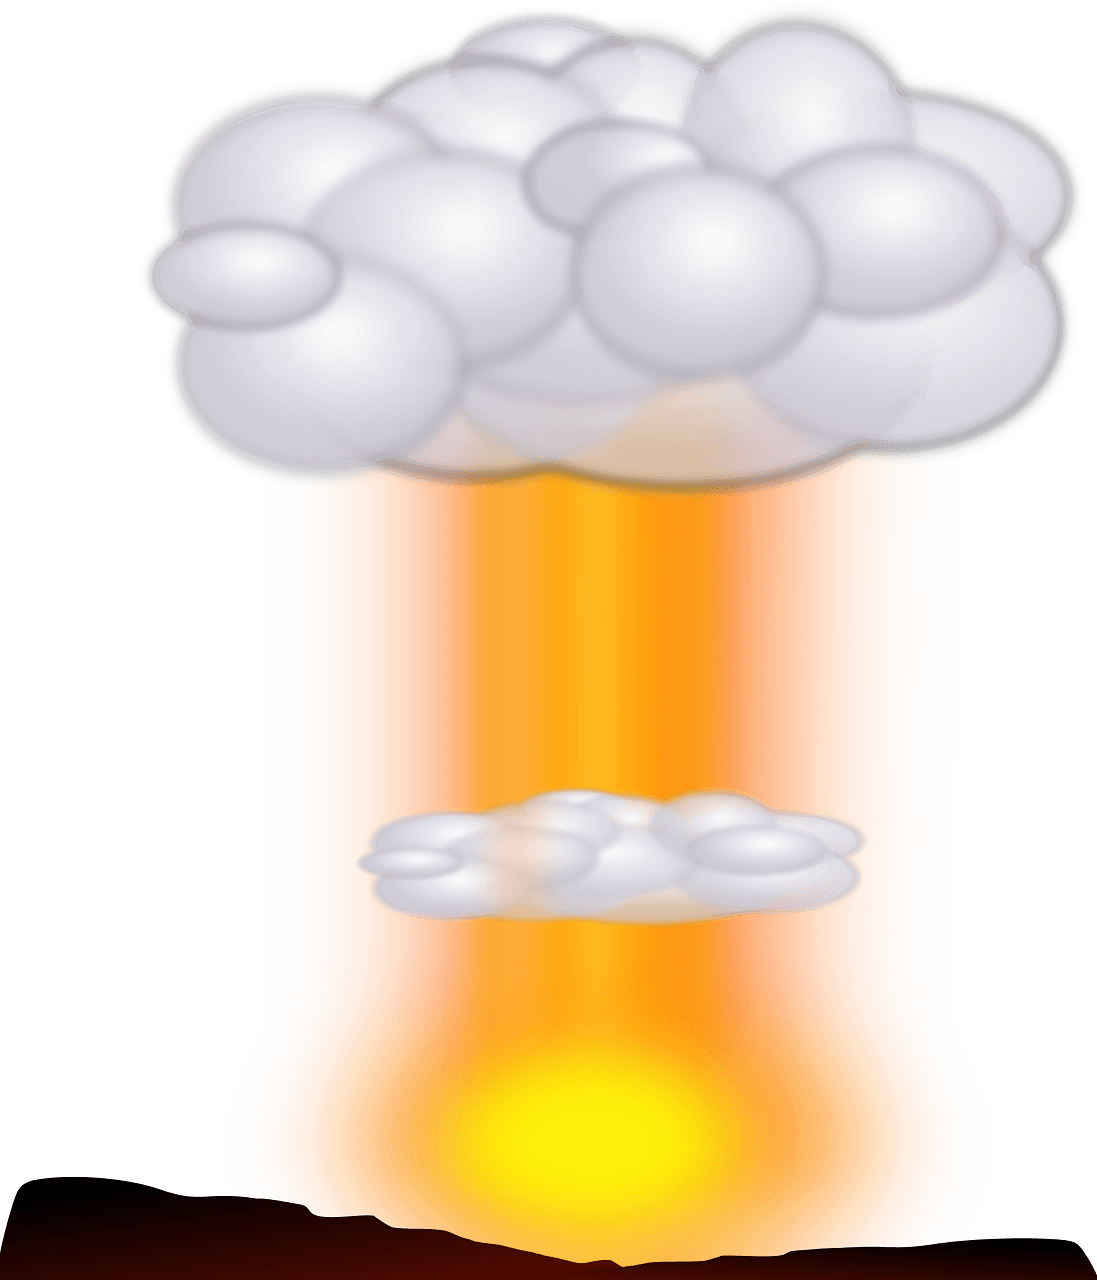 Nuclear Explosion clipart transparent 9